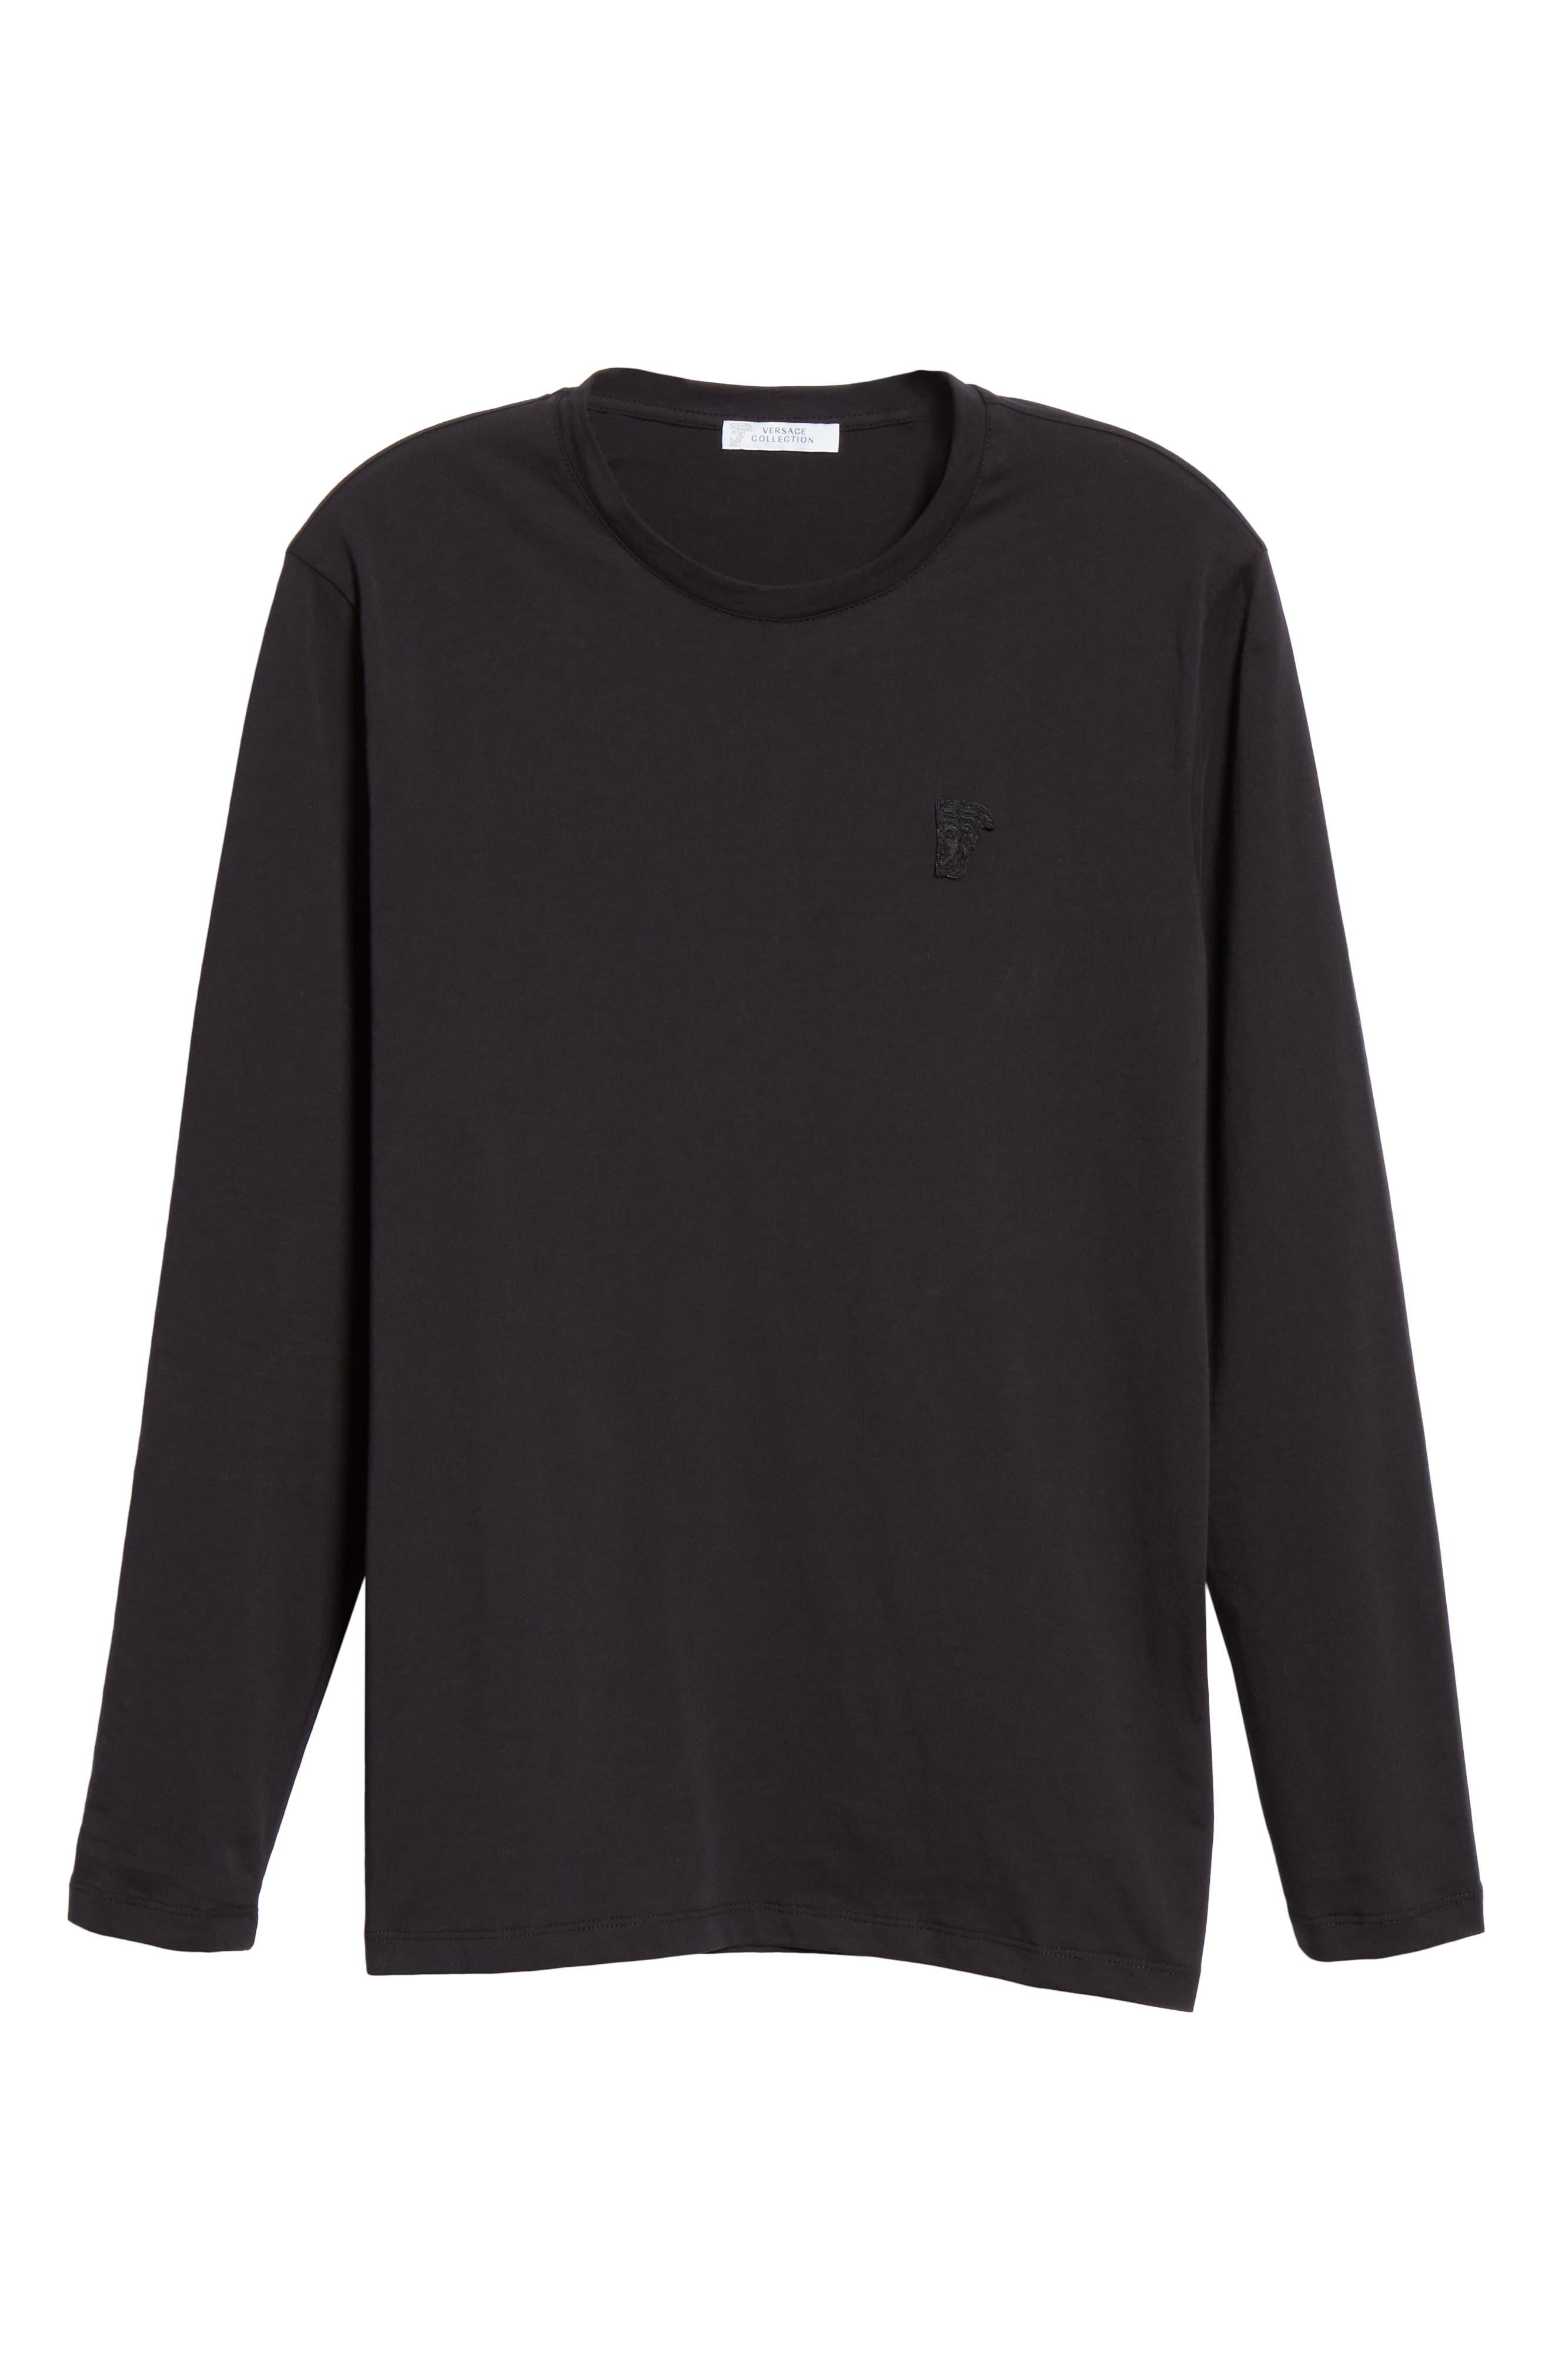 VERSACE COLLECTION, Medusa Long Sleeve T-Shirt, Alternate thumbnail 6, color, 001